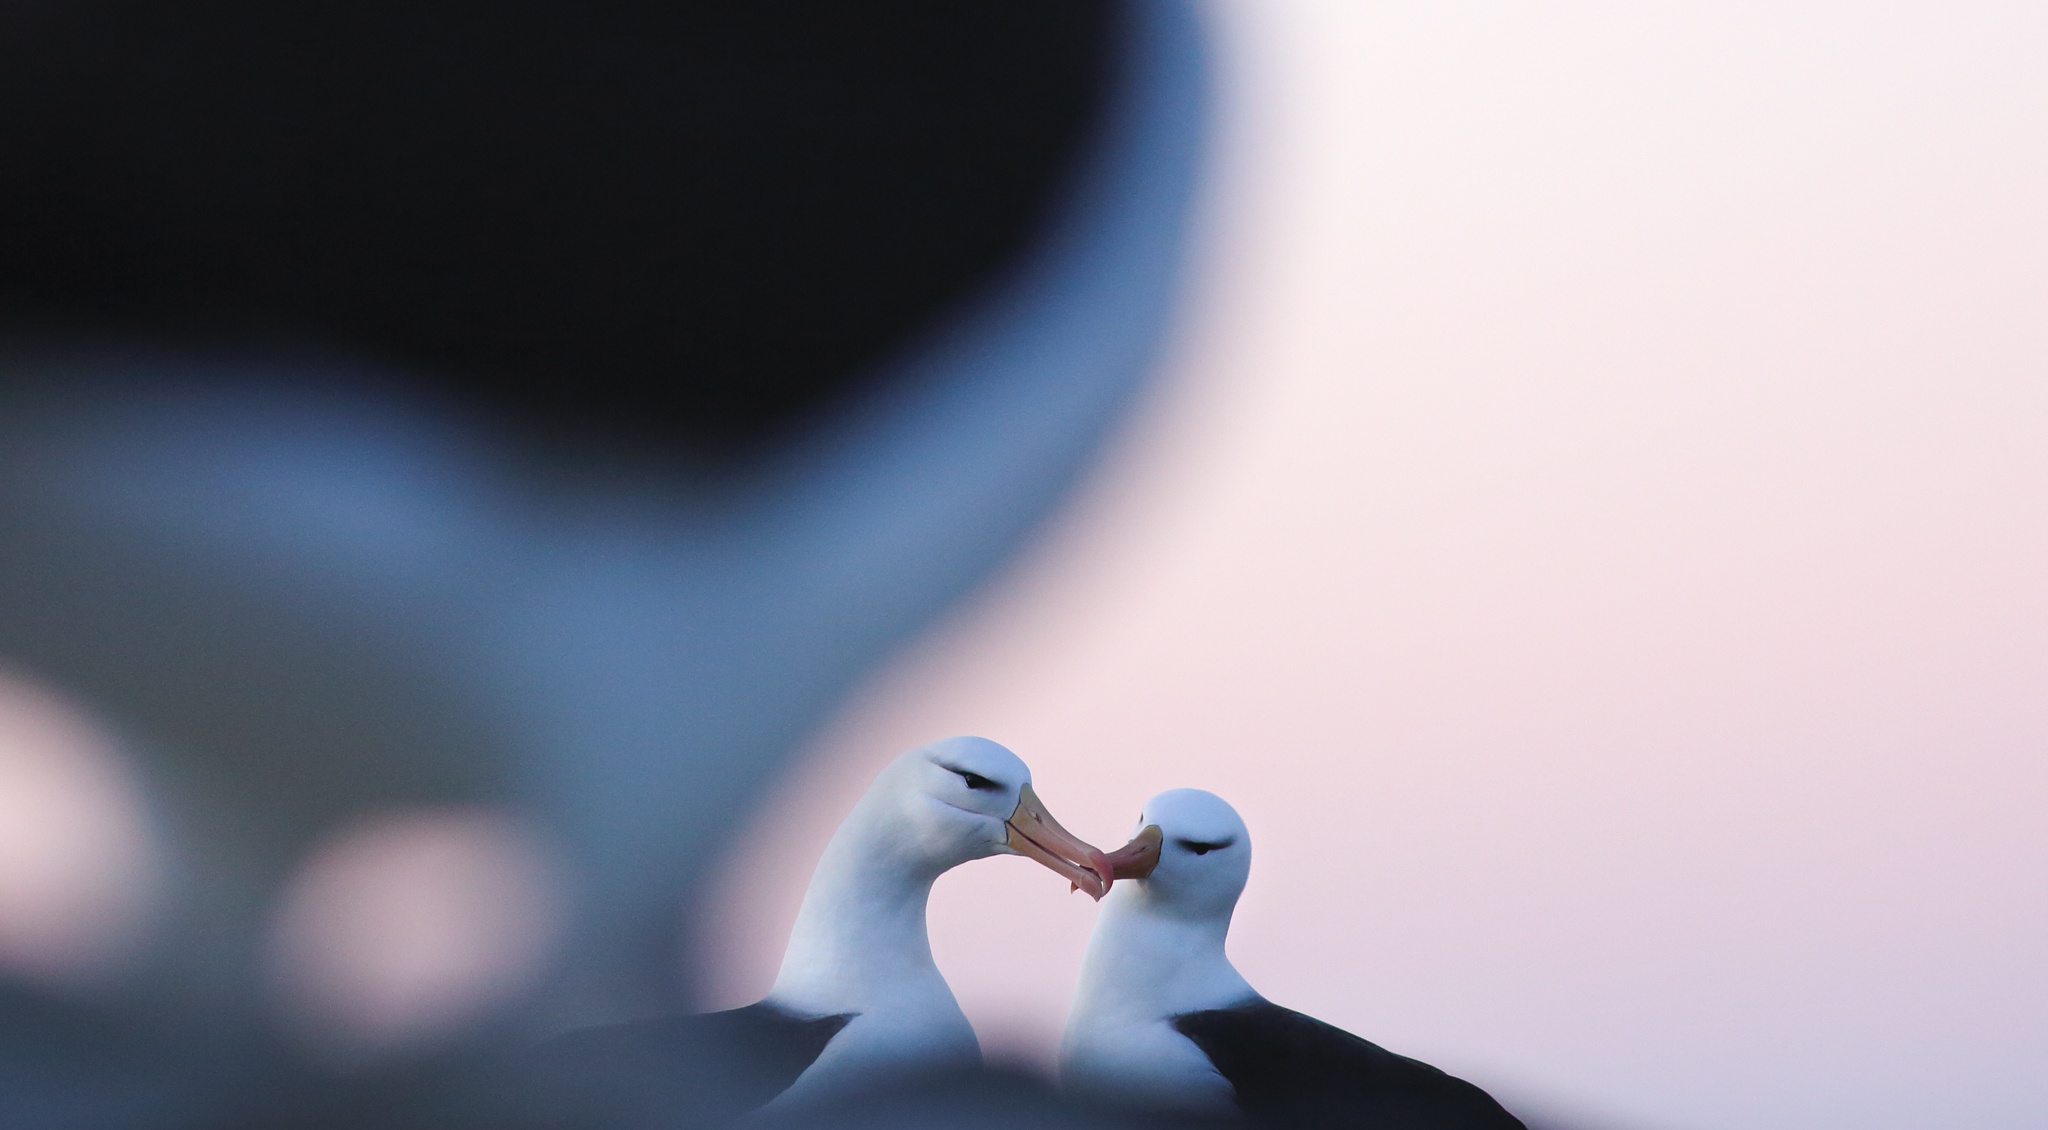 Black-browed albatross at dusk